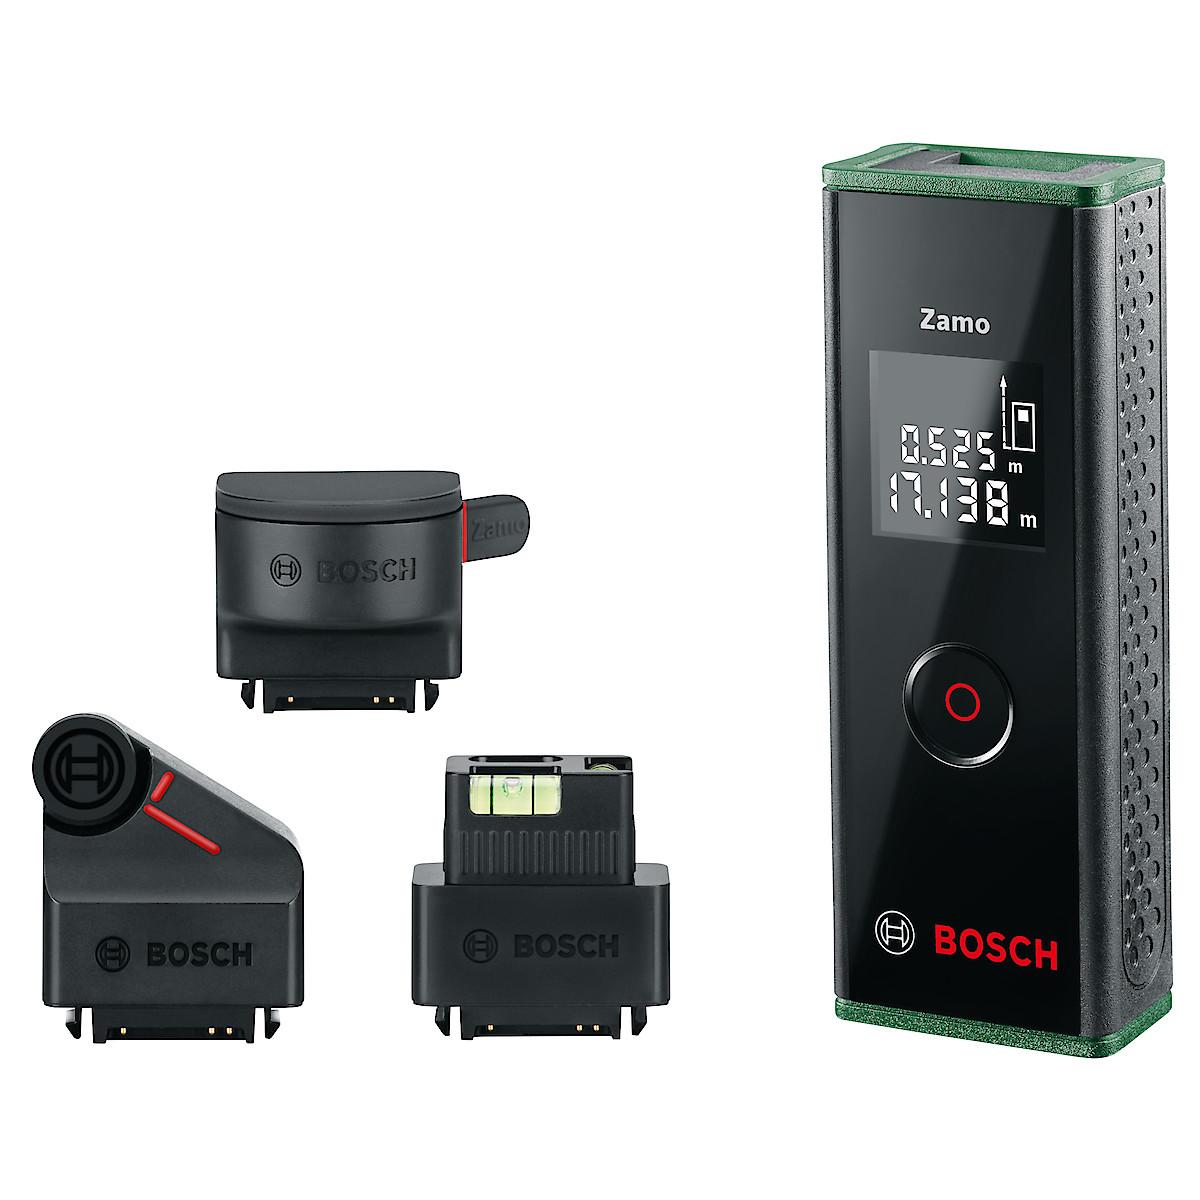 Bosch Zamo III Premium avstandsmåler med tilbehør